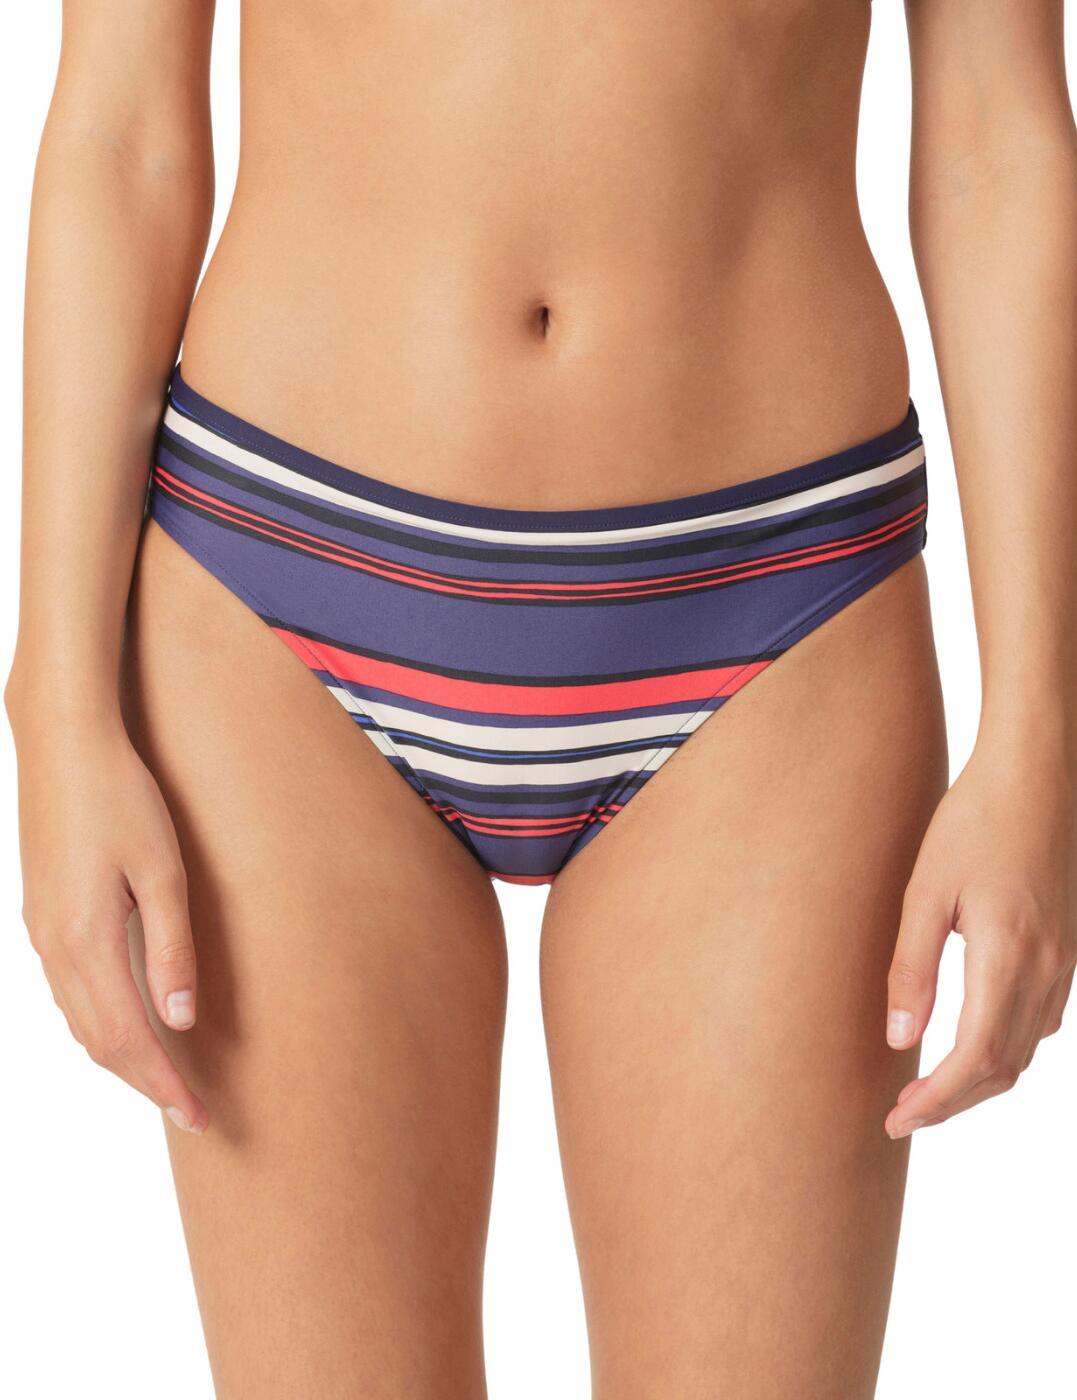 1000550 Marie Jo Juliette Bikini Briefs - 1000550 Portofine